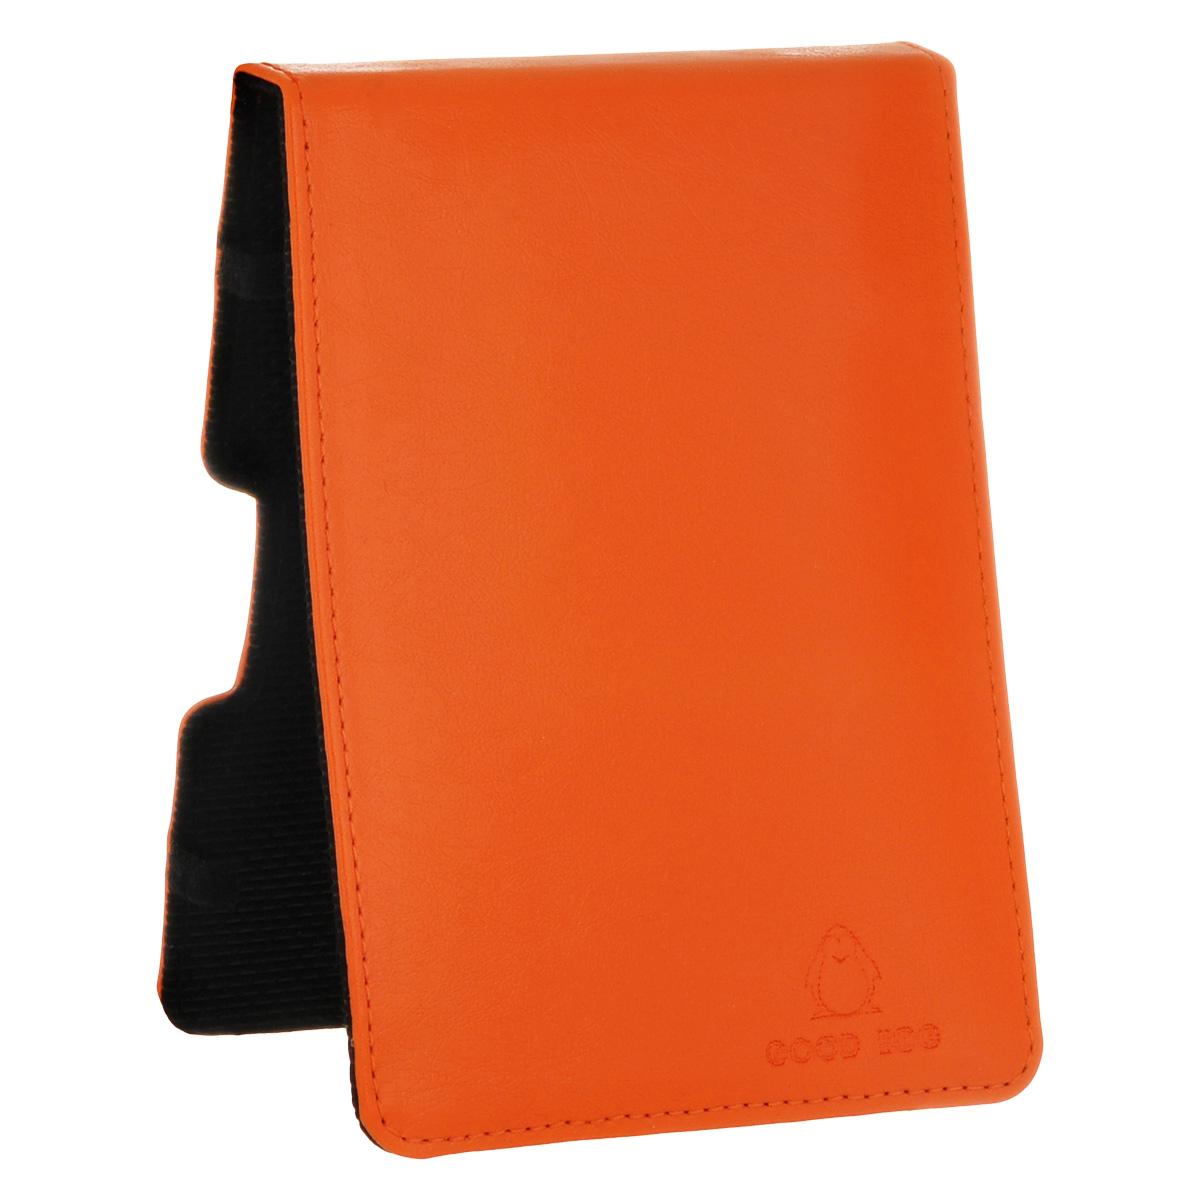 Good Egg Lira чехол для PocketBook 650, Orange GE-PB650LIR2250